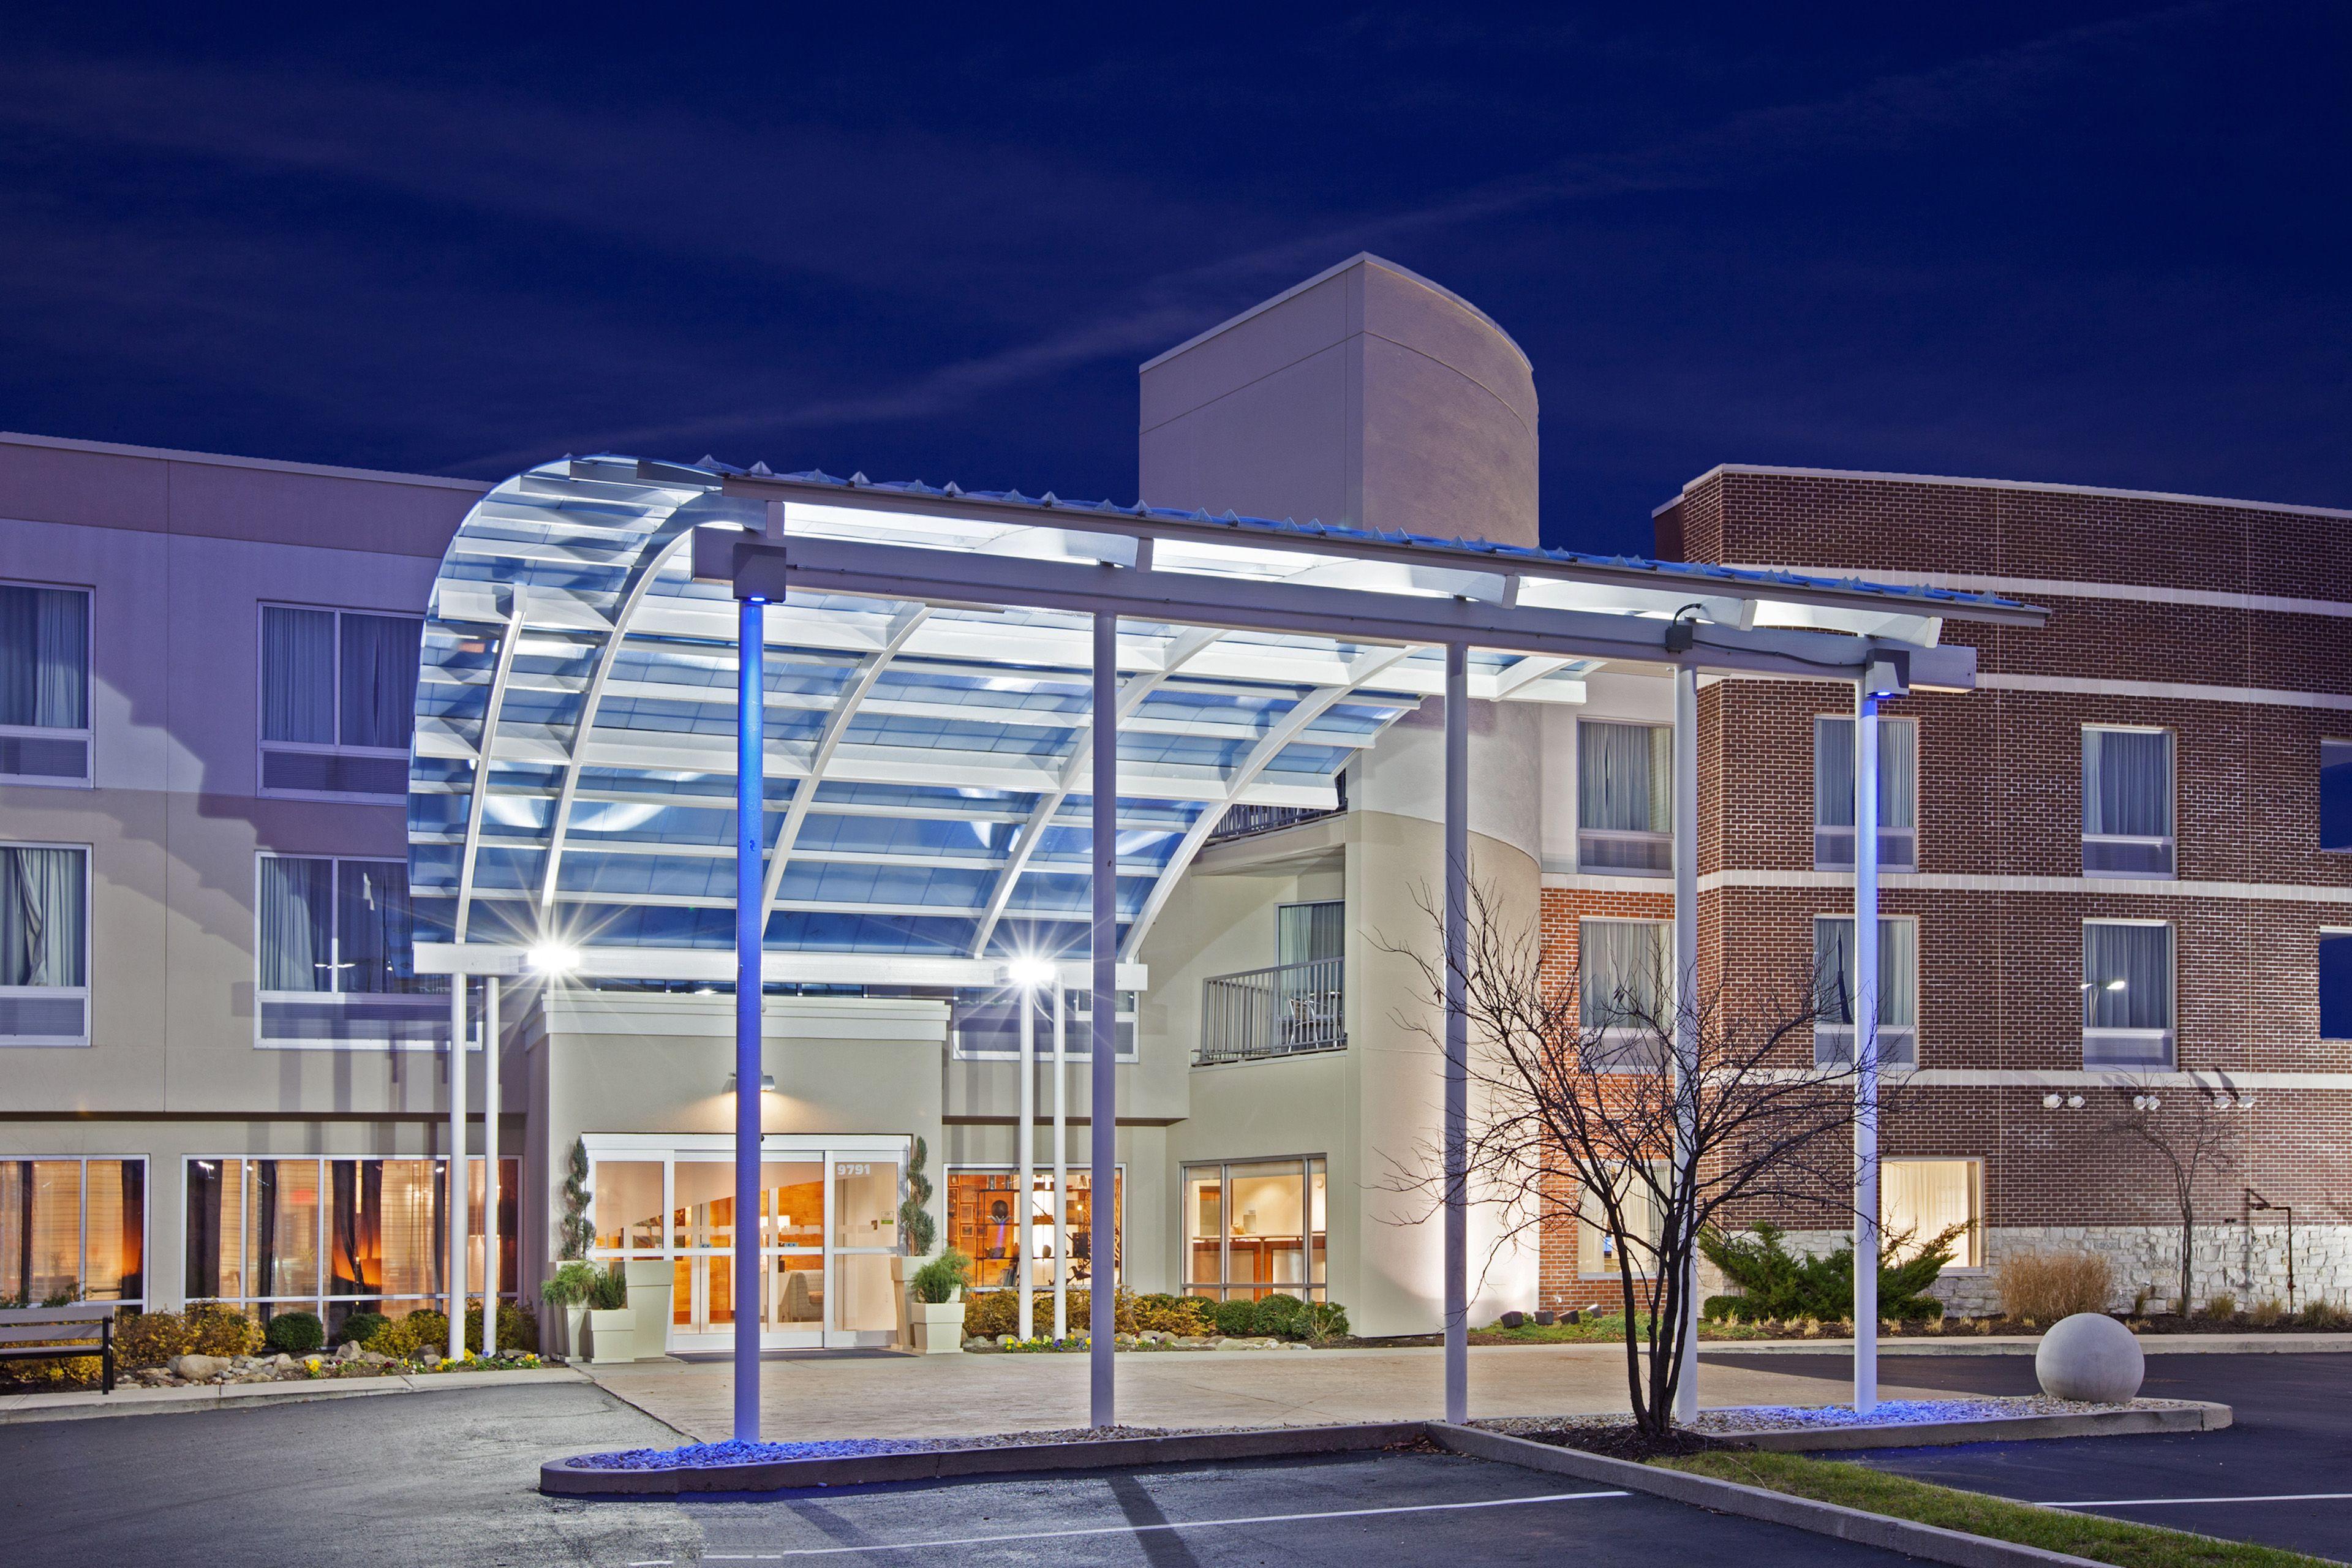 Hampton Inn by Hilton™